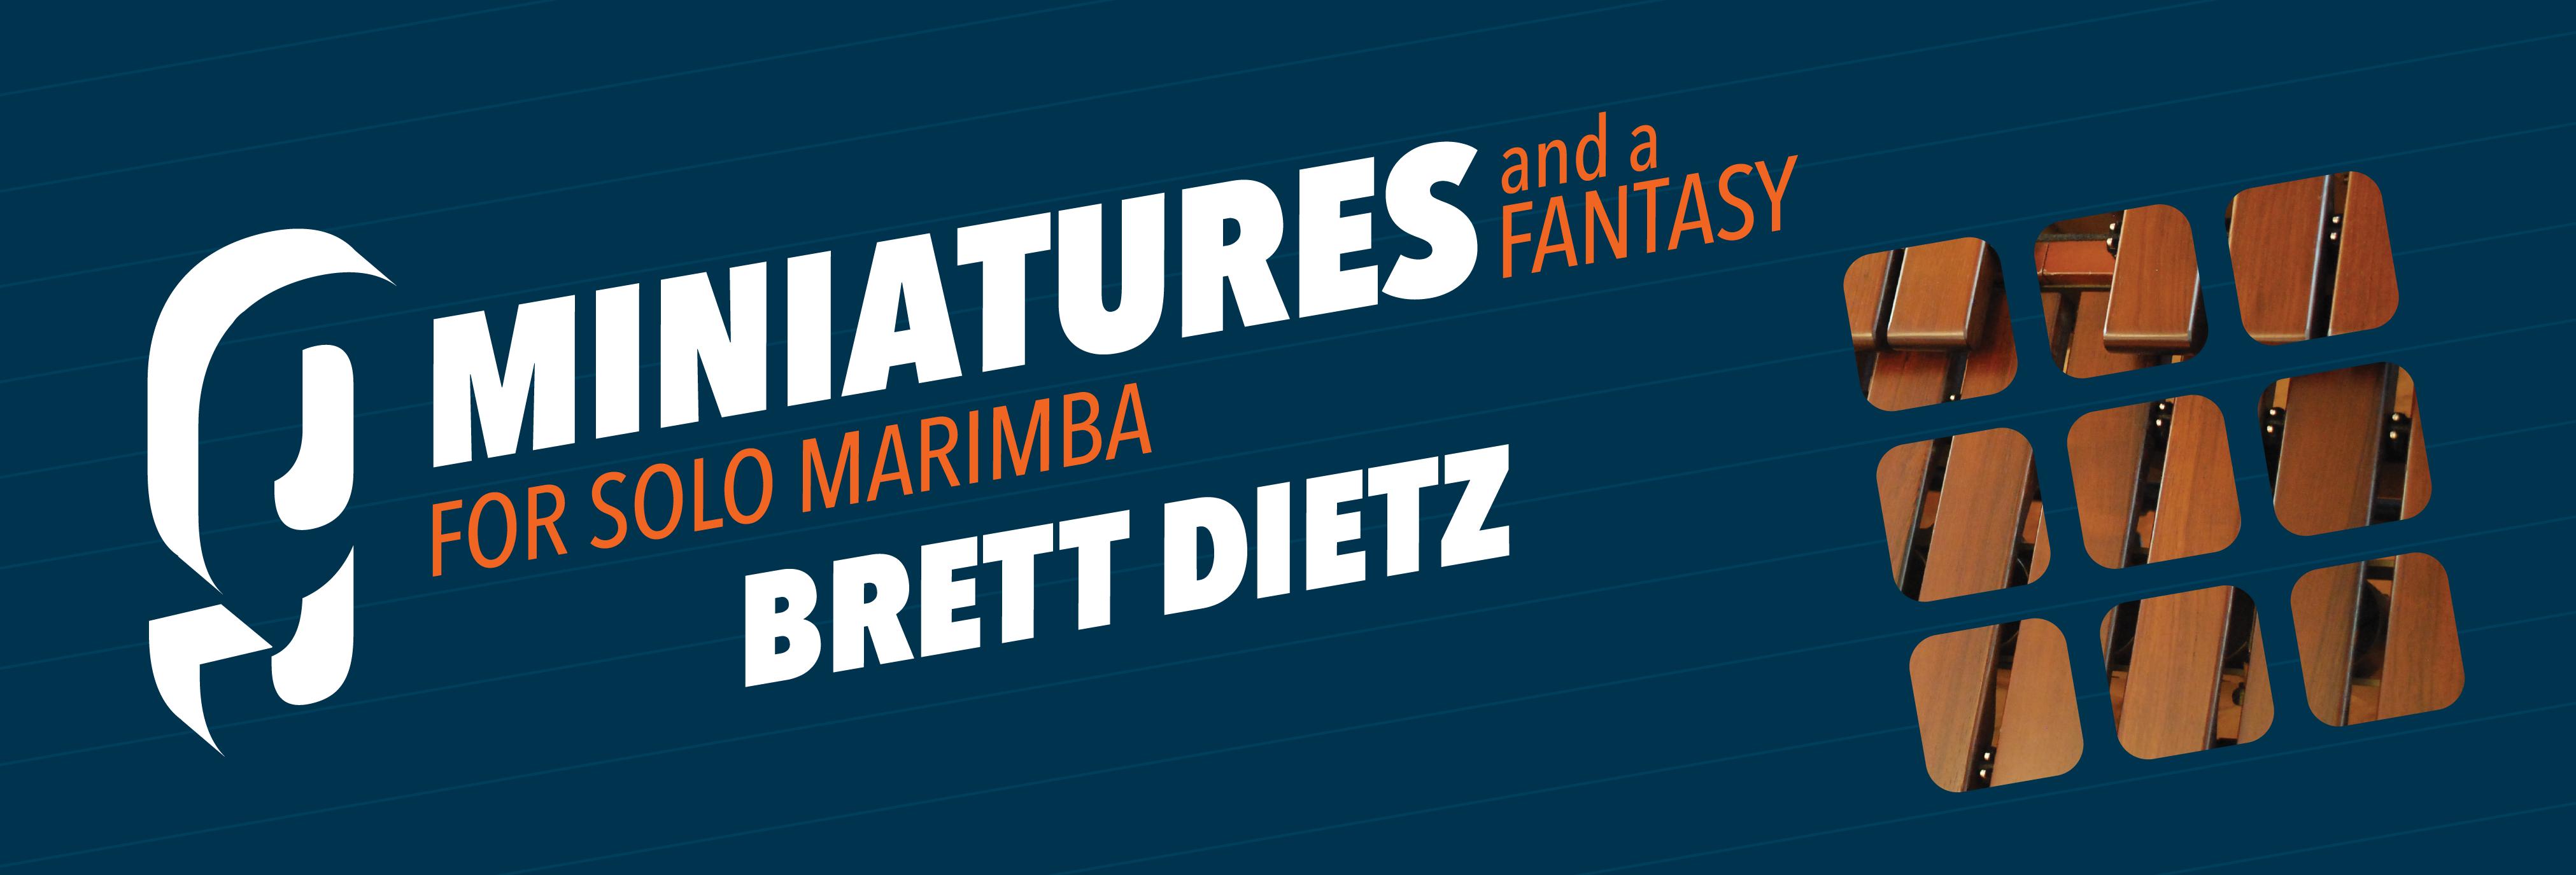 9 Miniatures & a Fantasy for Solo Marimba - Brett Dietz